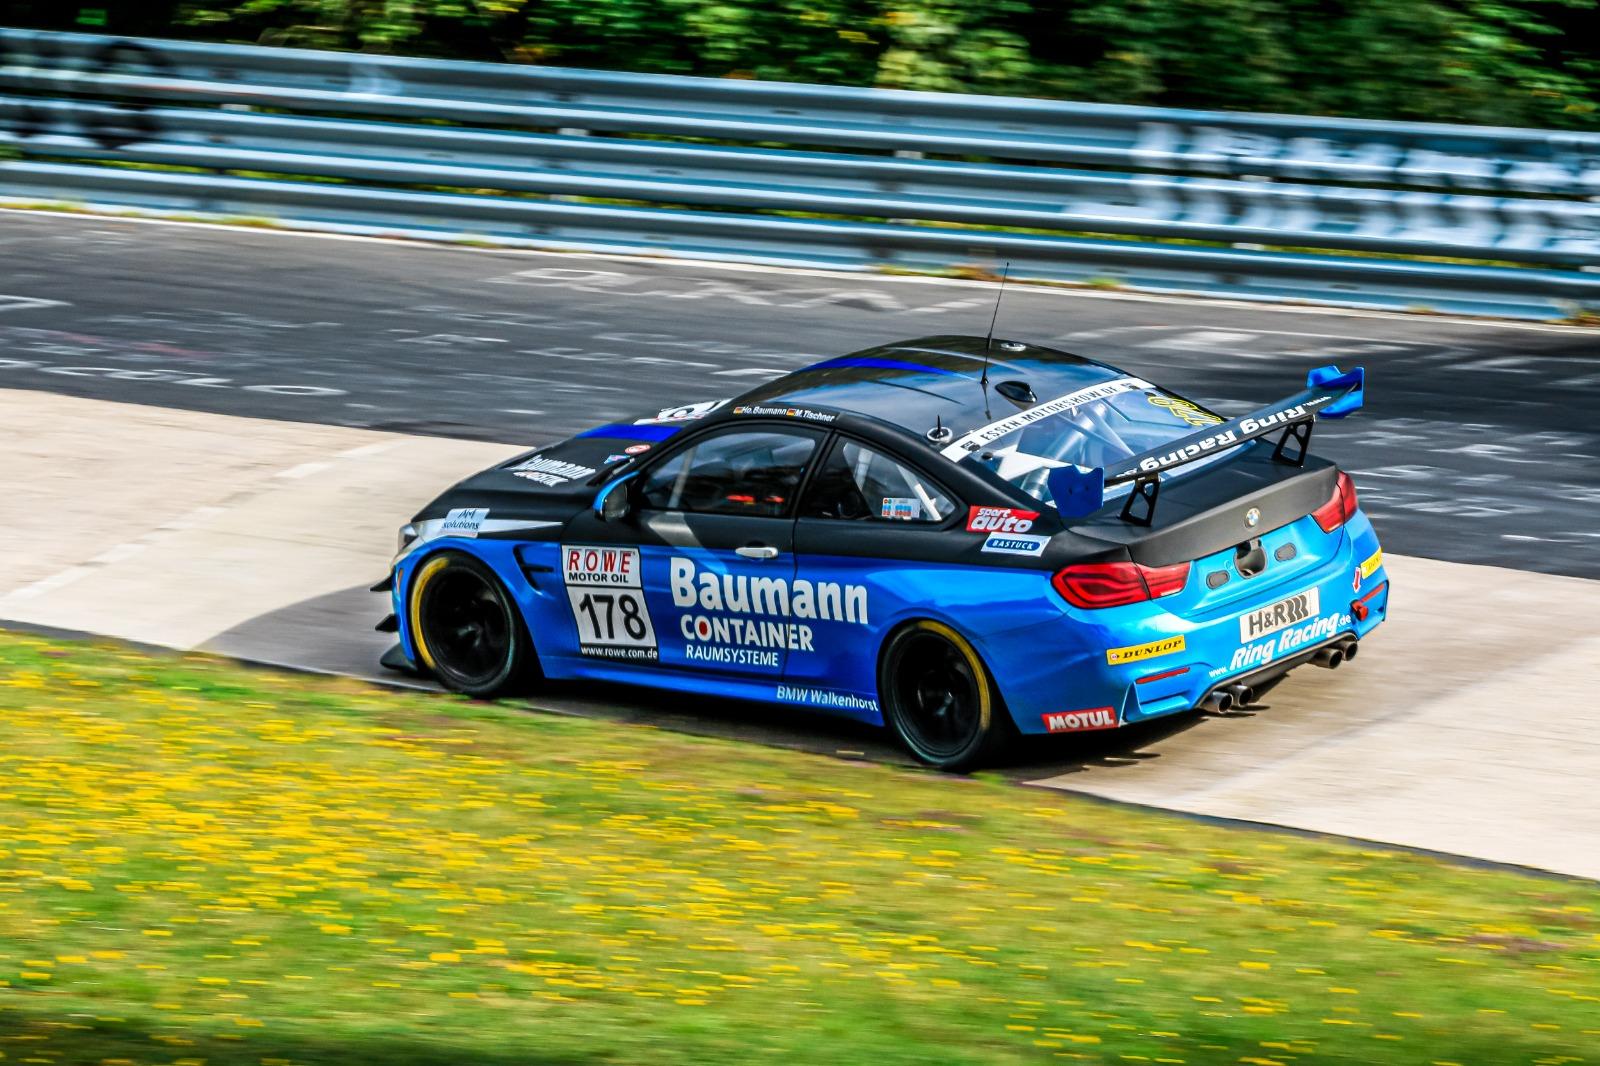 Horst Baumann Michael Tischner Klaus Niesen Ring Racing with Novel Racing BMW M4 GT4 VLN Nürburgring